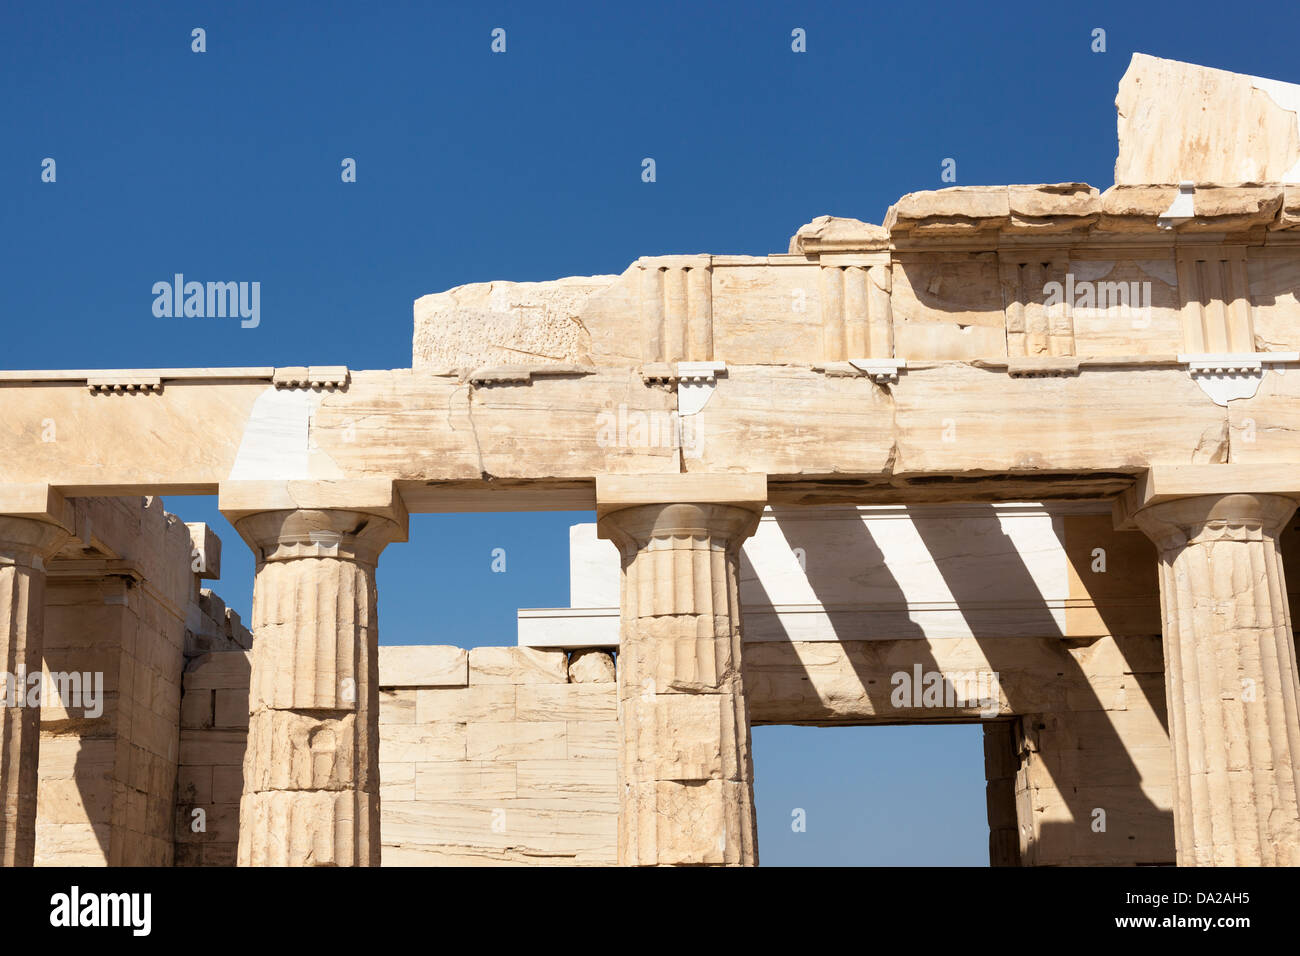 The Propylaea, the entrance to the Acropolis, Athens, Greece - Stock Image